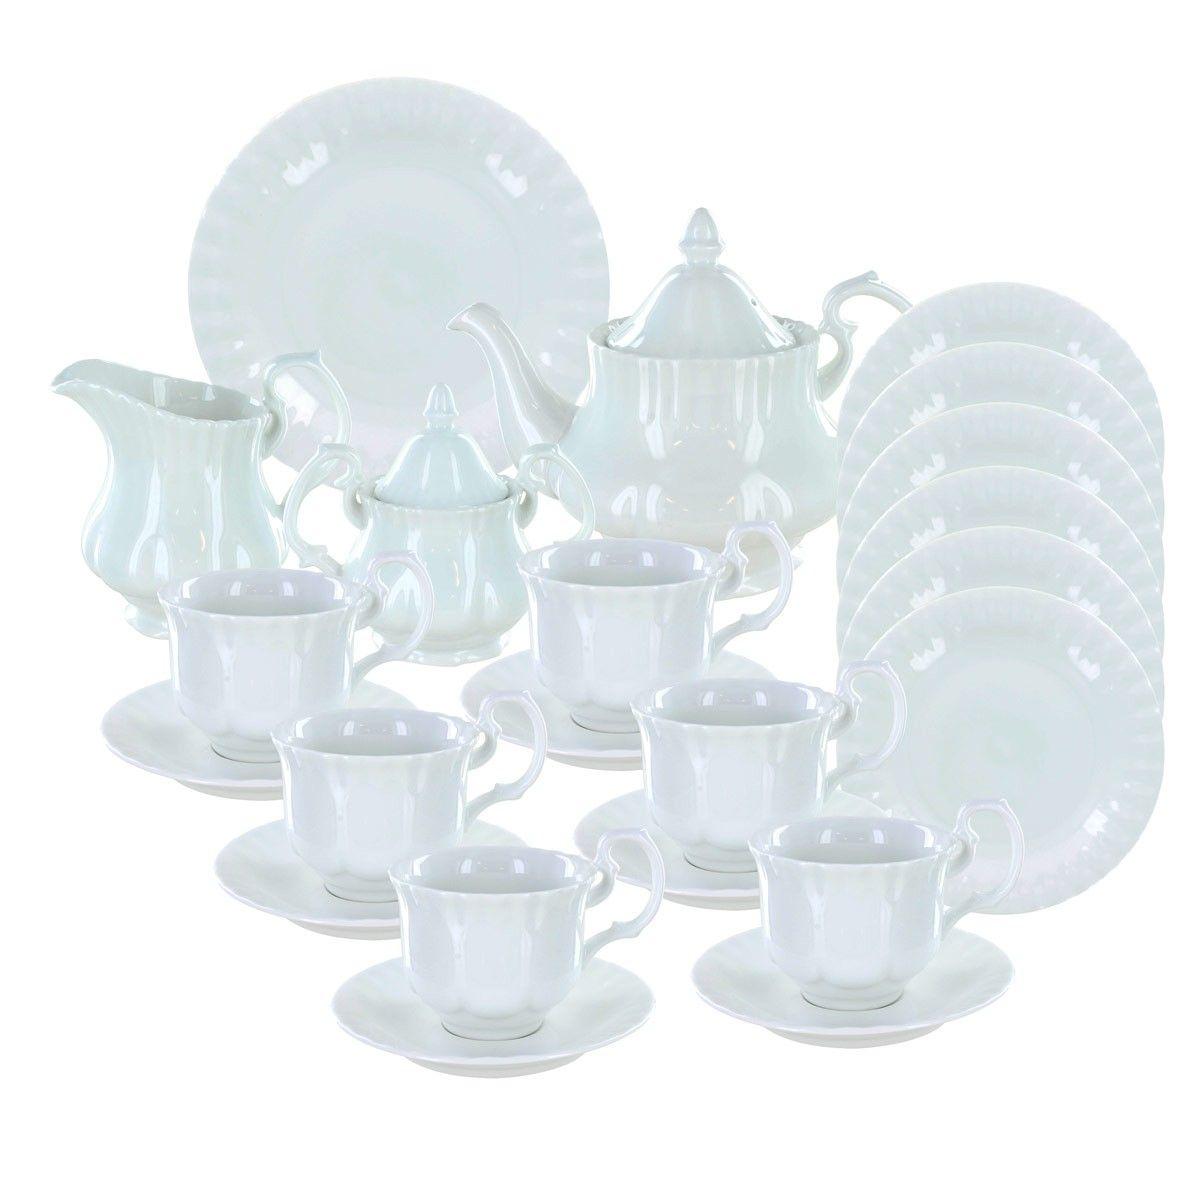 Avery Deluxe Porcelain Tea Set